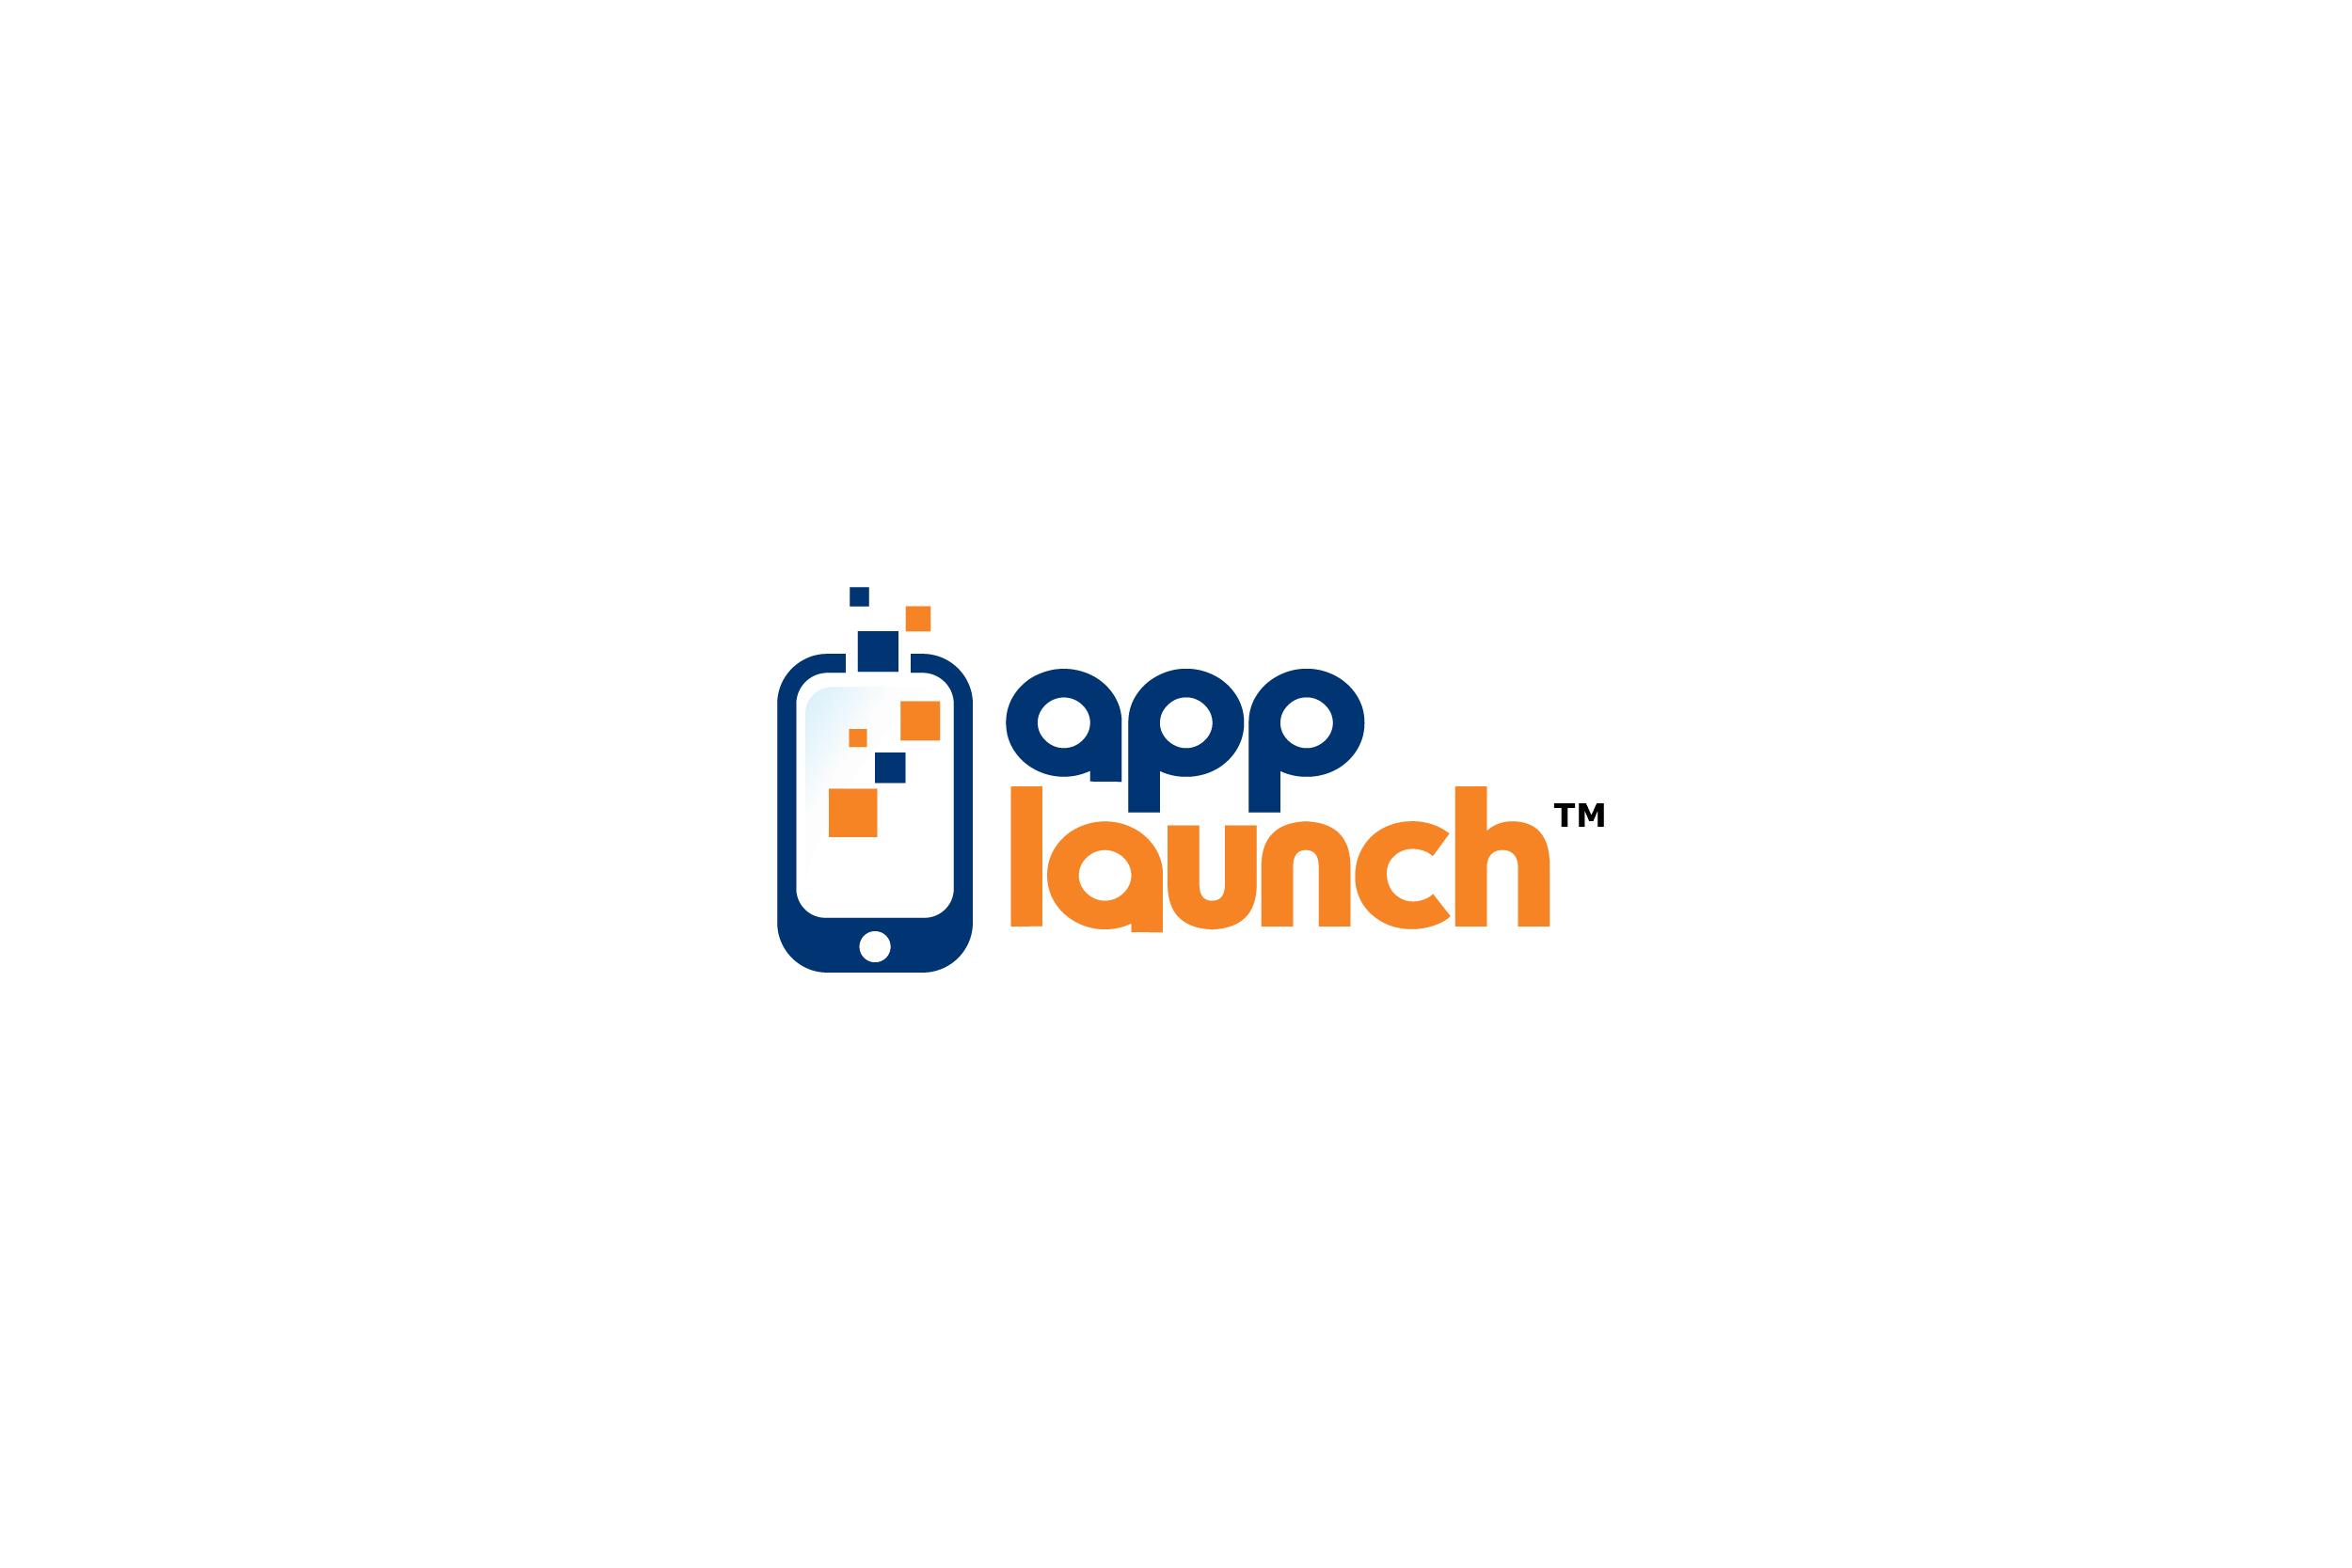 app-launch